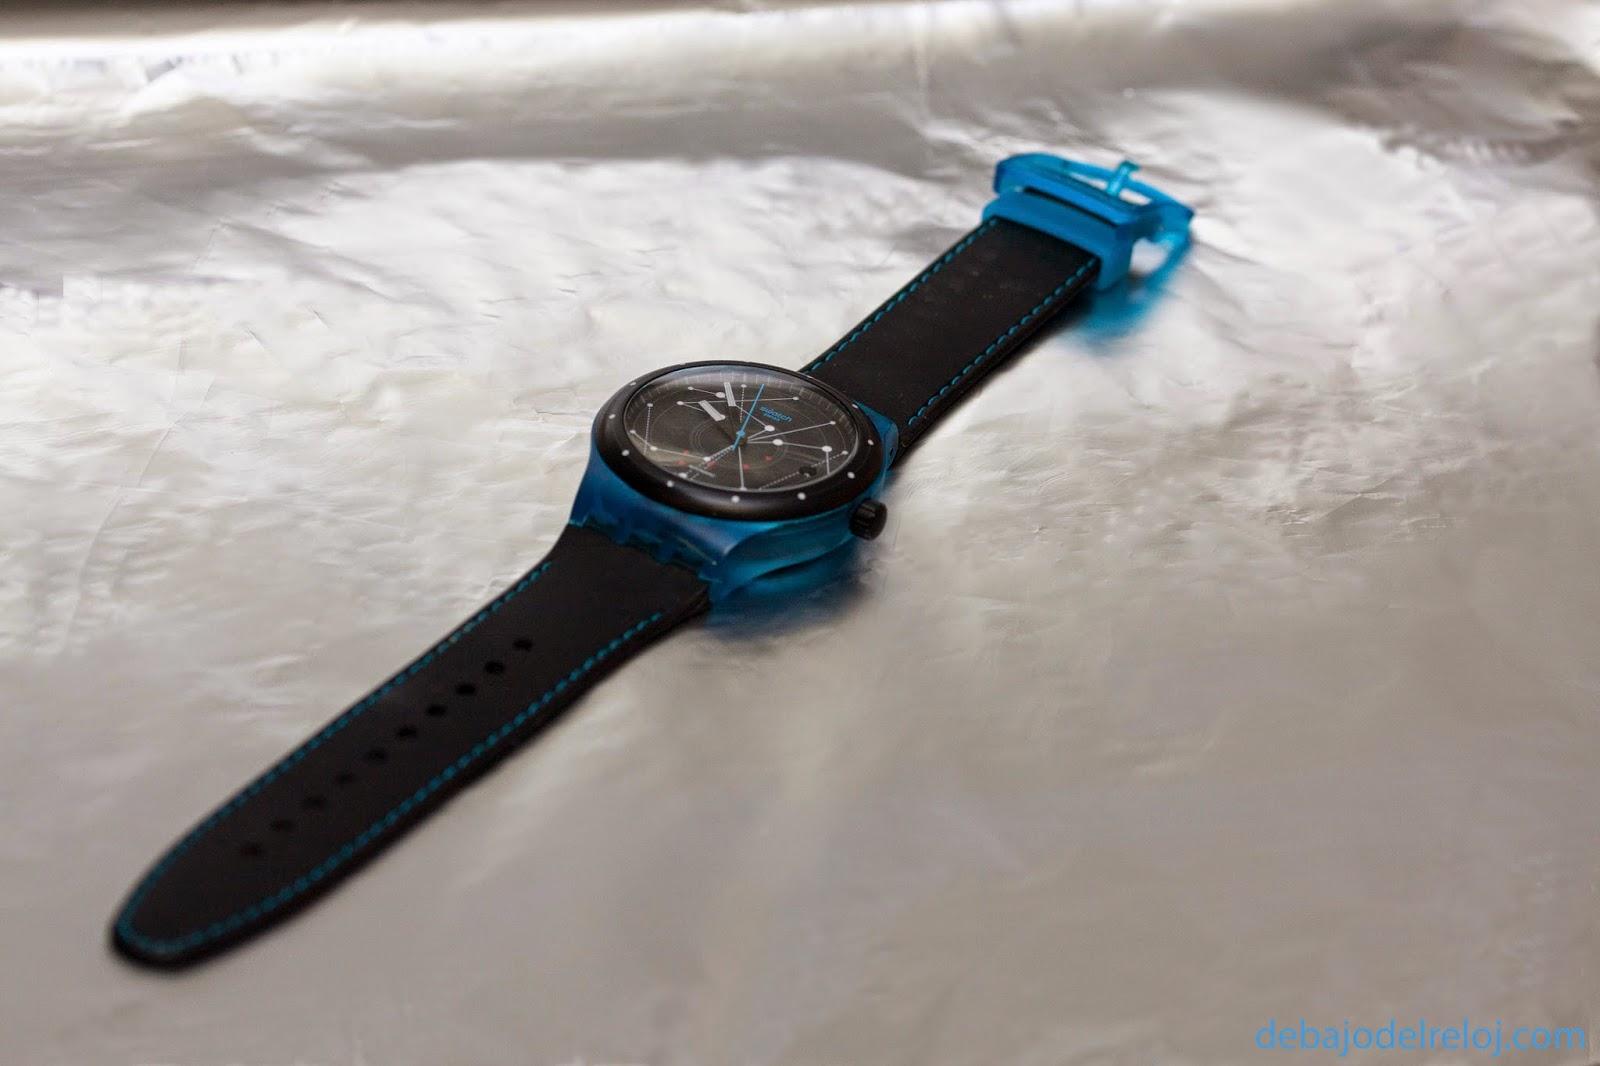 Uno de mis relojes: Swatch Sistem51 debajodelreloj